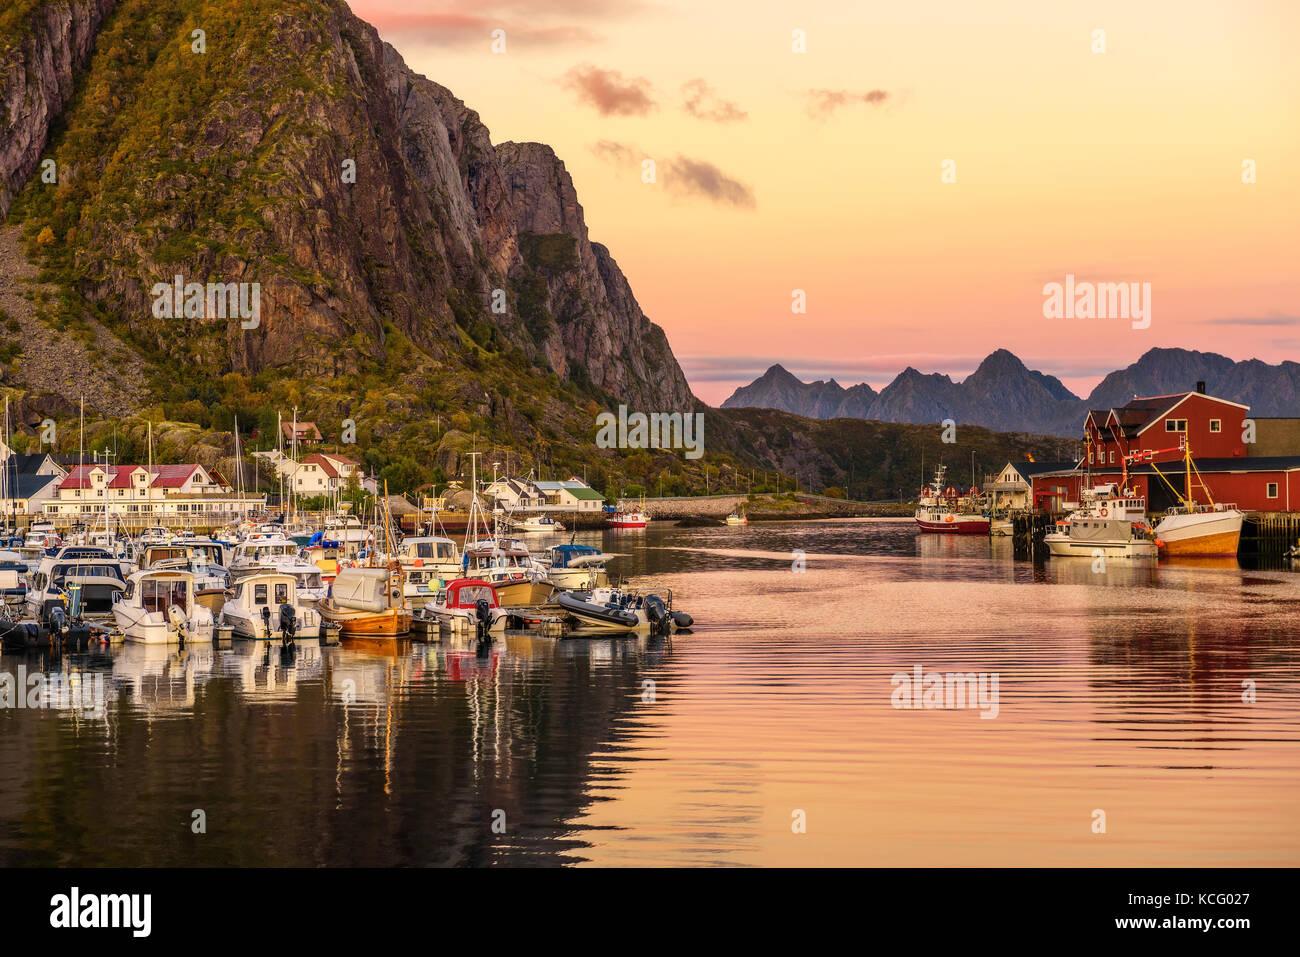 Many yachts anchored at the Marina of Svolvaer on Lofoten islands in Norway - Stock Image